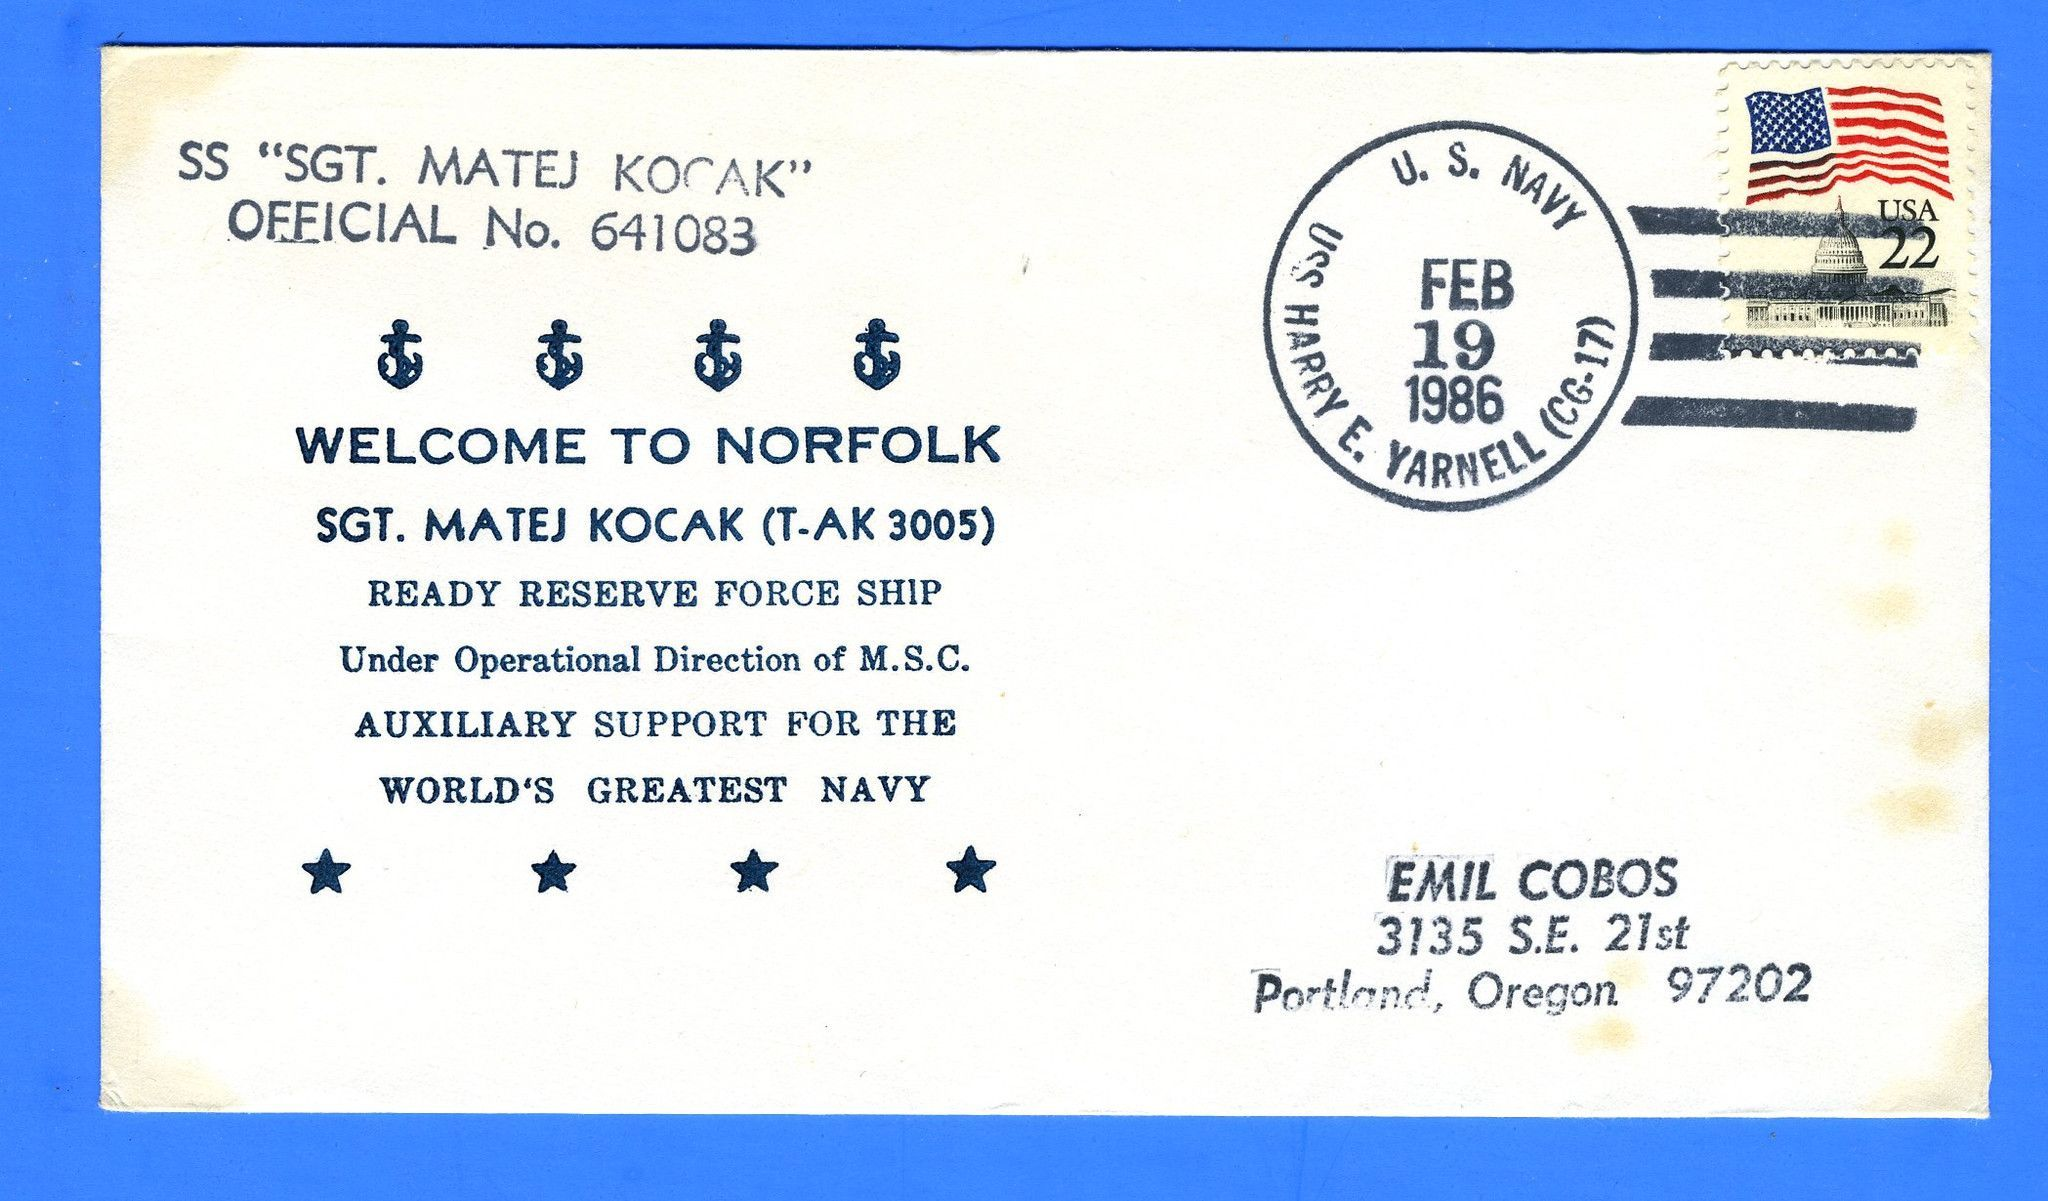 USNS Sgt Matej Kocak T-AK-3005 February 19, 1986 - Canceled USS Harry E. Yarnell CG-17 - Cachet by Tazewell G. Nicholson